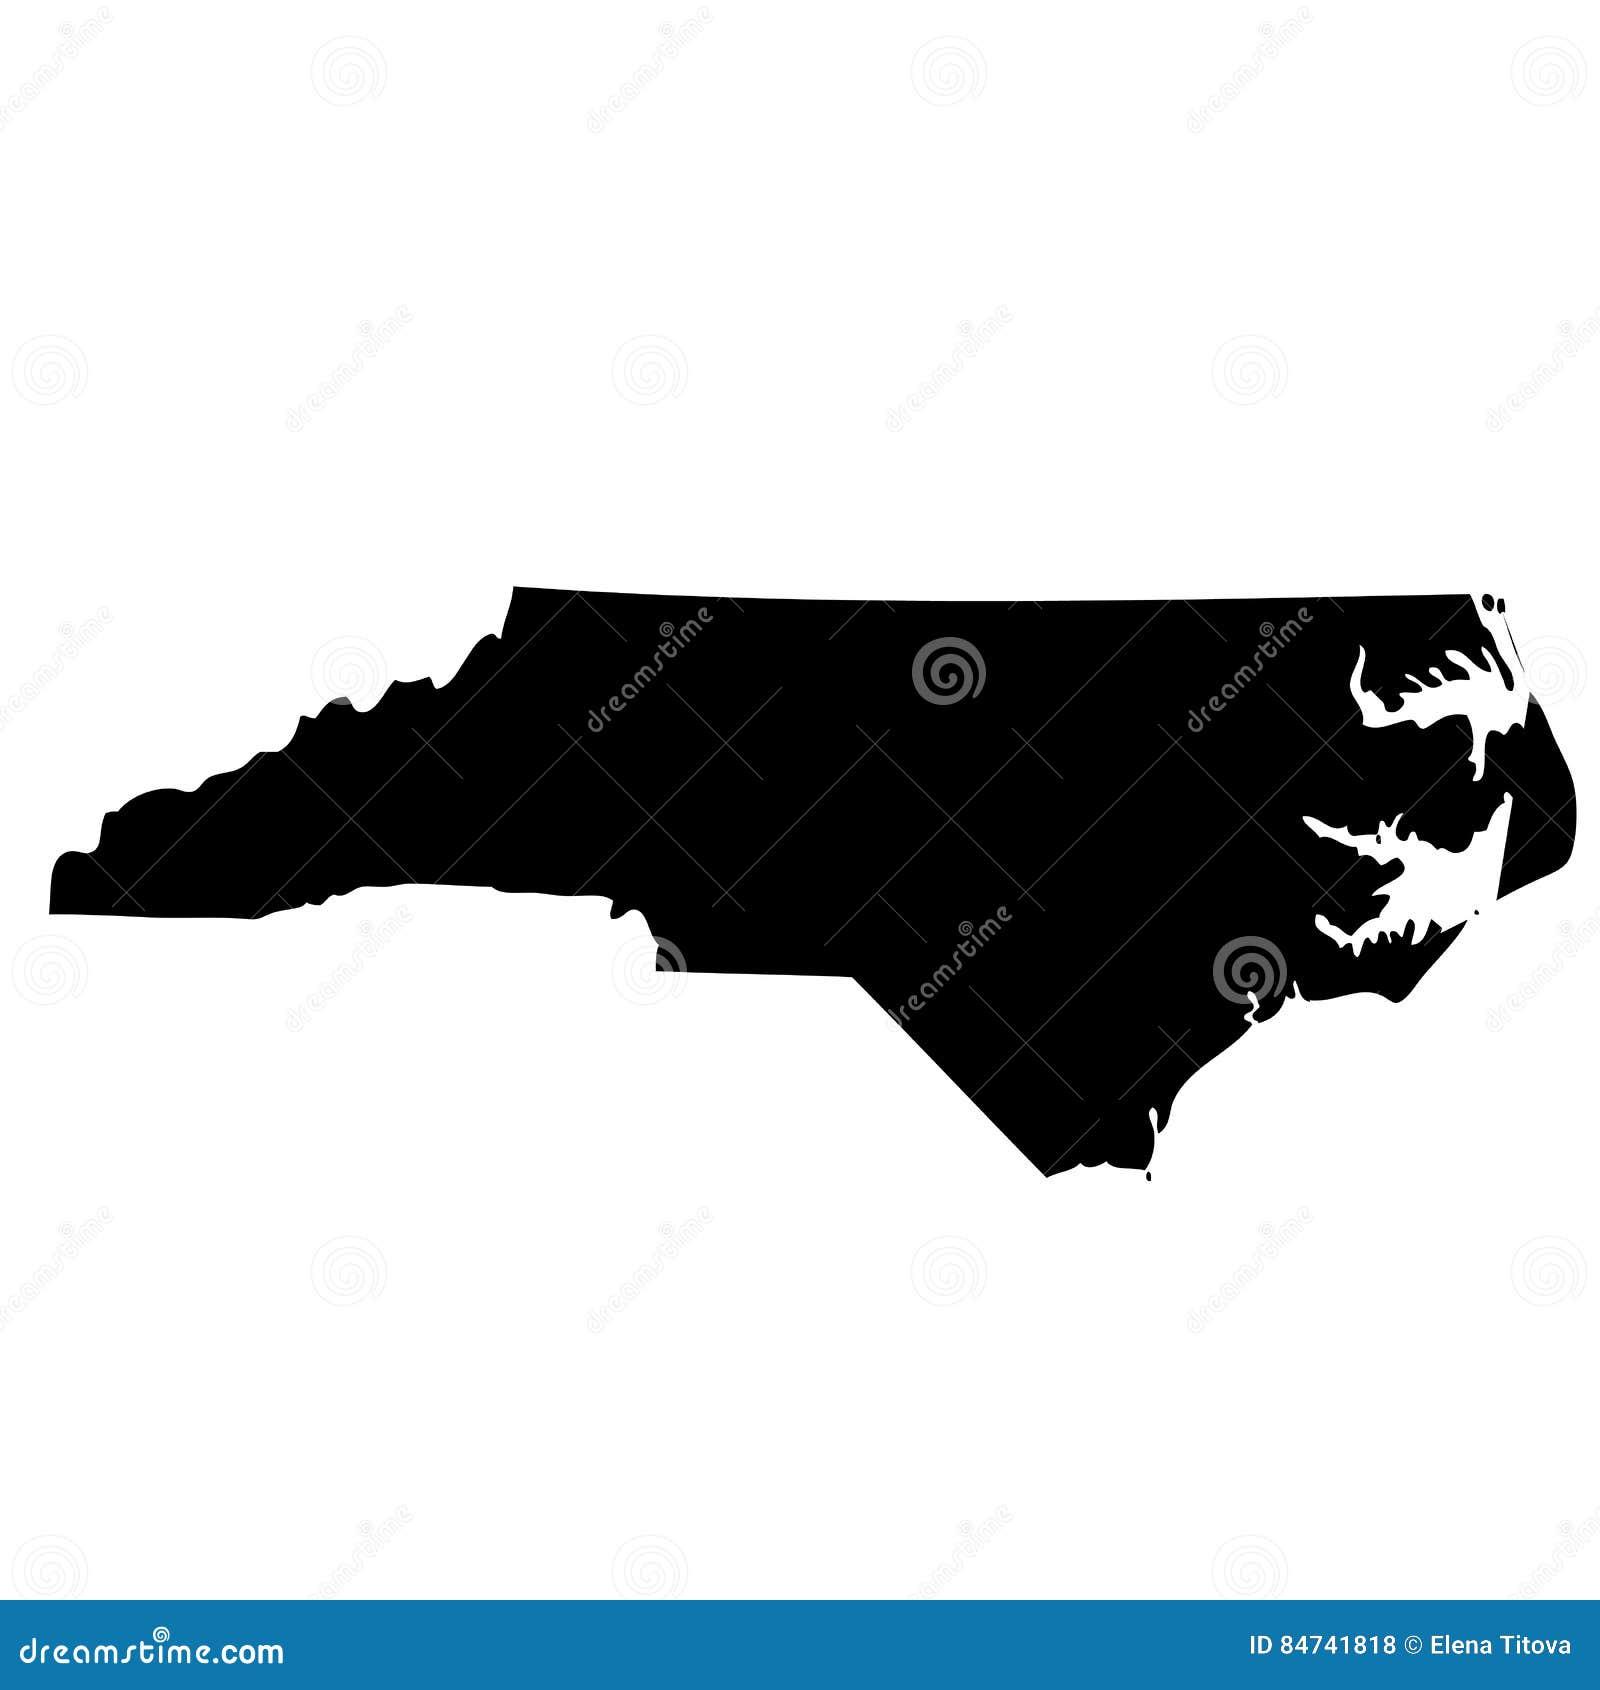 Map Of The U. S. State North Carolina Stock Vector ... North Carolina On Us Map With Comp on north carolina back then, beech mountain nc map, denver north carolina map, bern north carolina map, north carolina's map, north carolina mountains, state of n carolina map, city of north carolina map, north carolina casinos locations, north carolina home map, north carolina on globe, hotel charlotte north carolina map, charleston south carolina on us map, north carolina in us, north carolina highway map, north carolina map with cities only, north dakota, small towns north carolina map, alabama river us map, north carolina on a map,